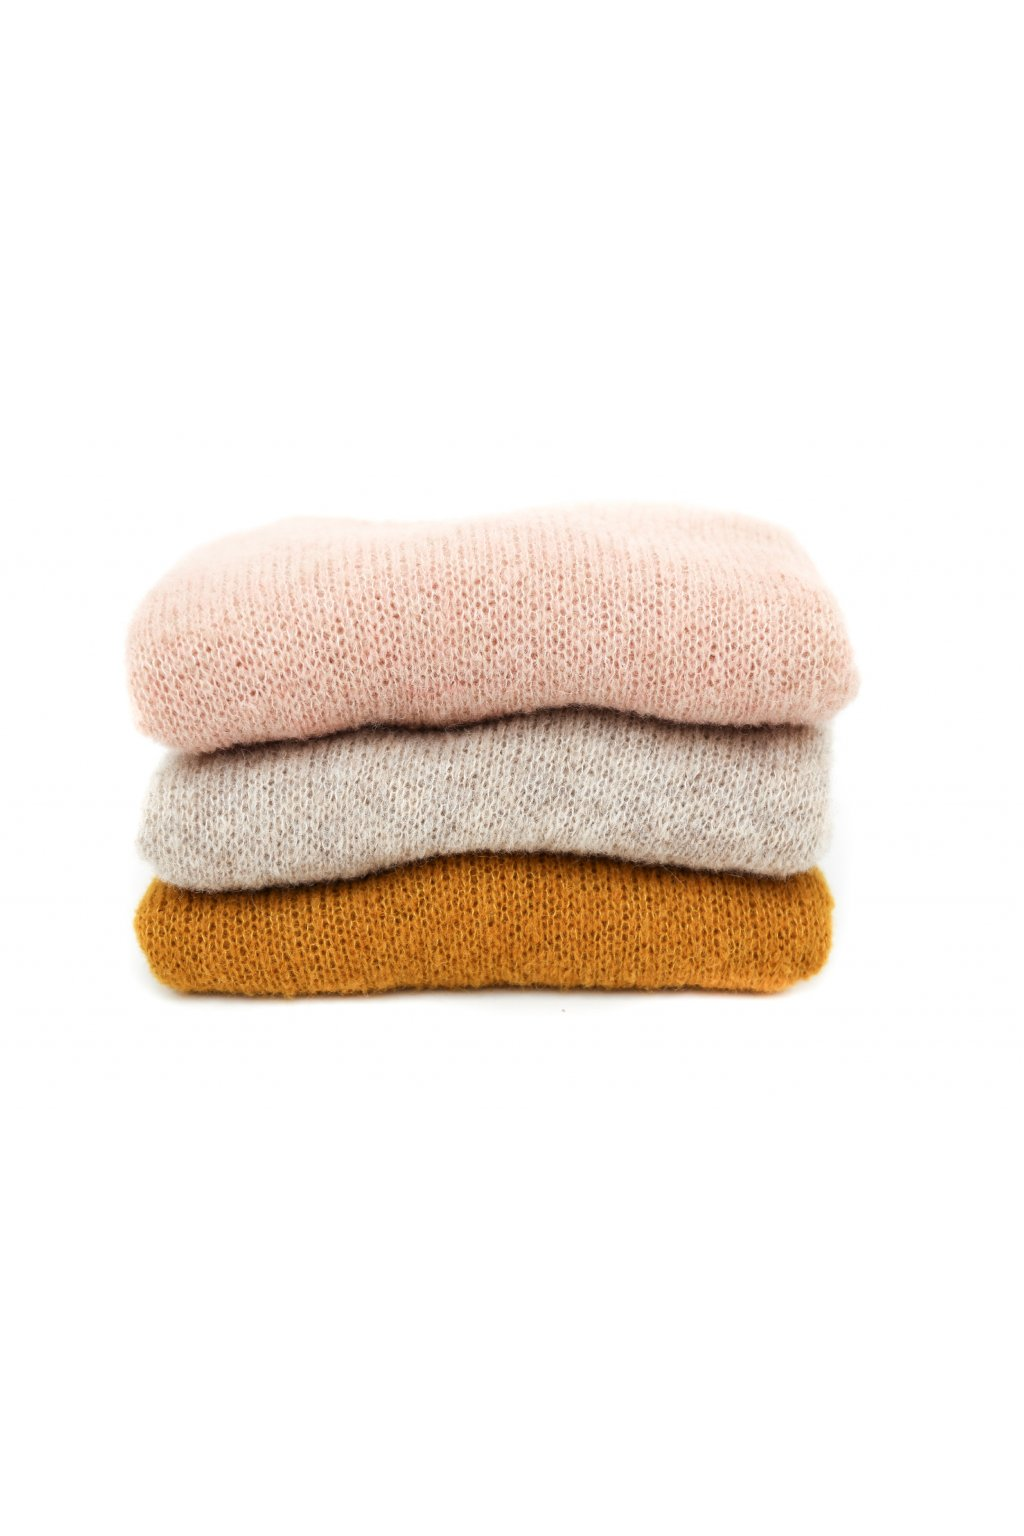 Ručně pletené svetry Milli Style Alpaca